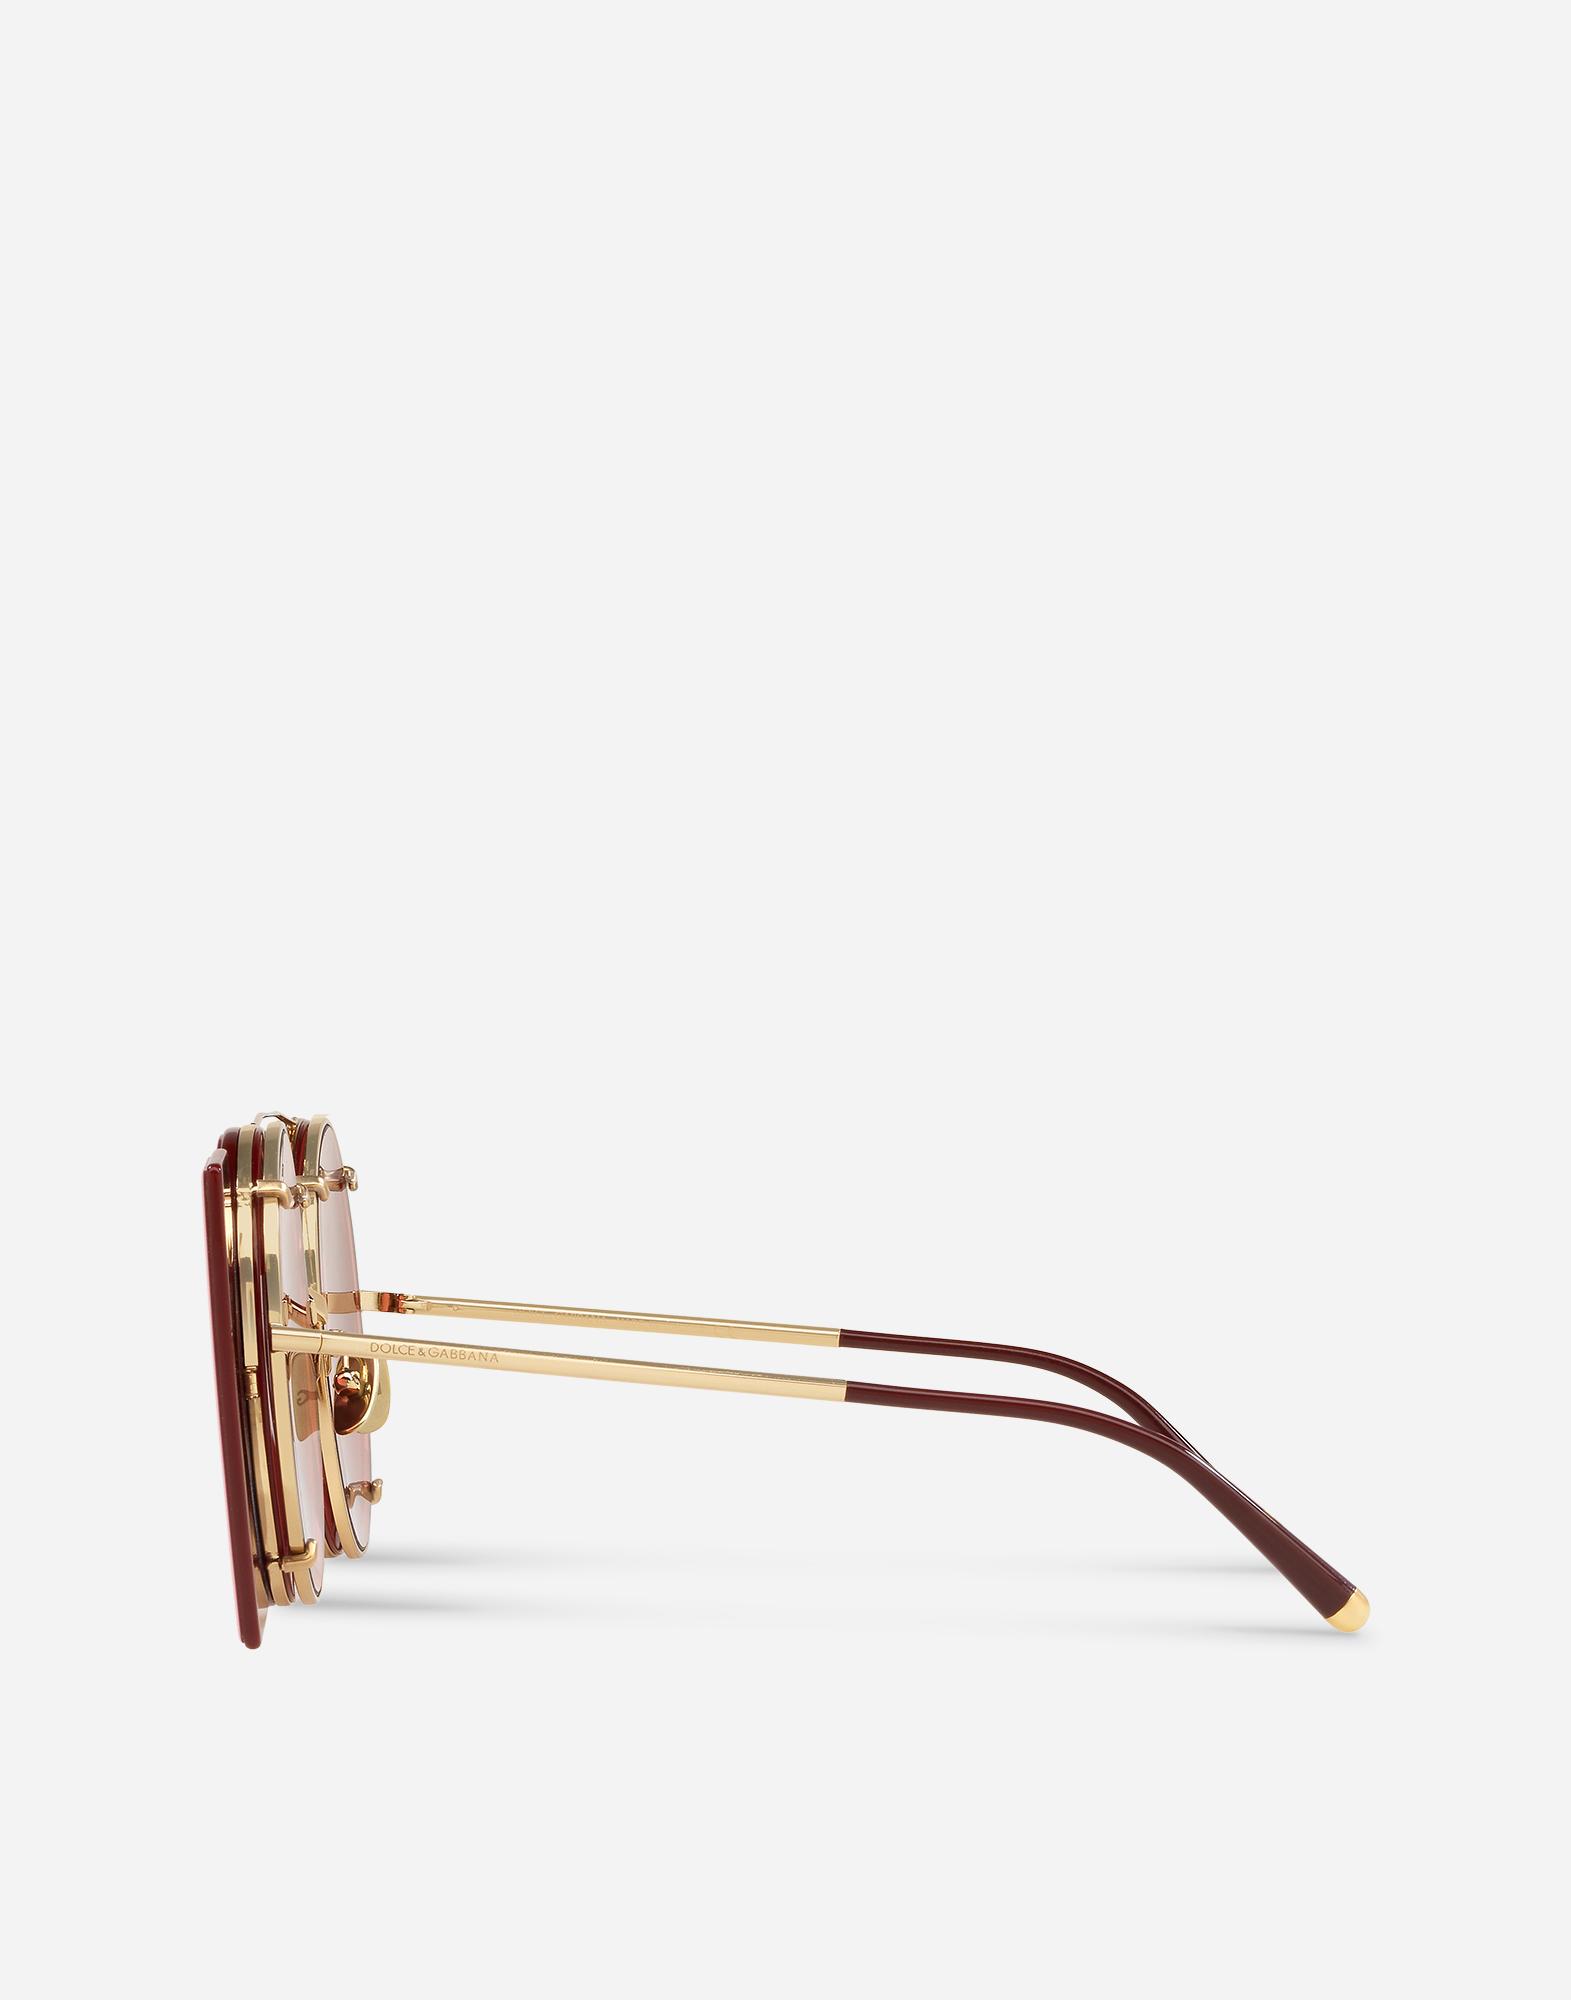 Dolce & Gabbana SUNGLASSES IN GOLD METAL